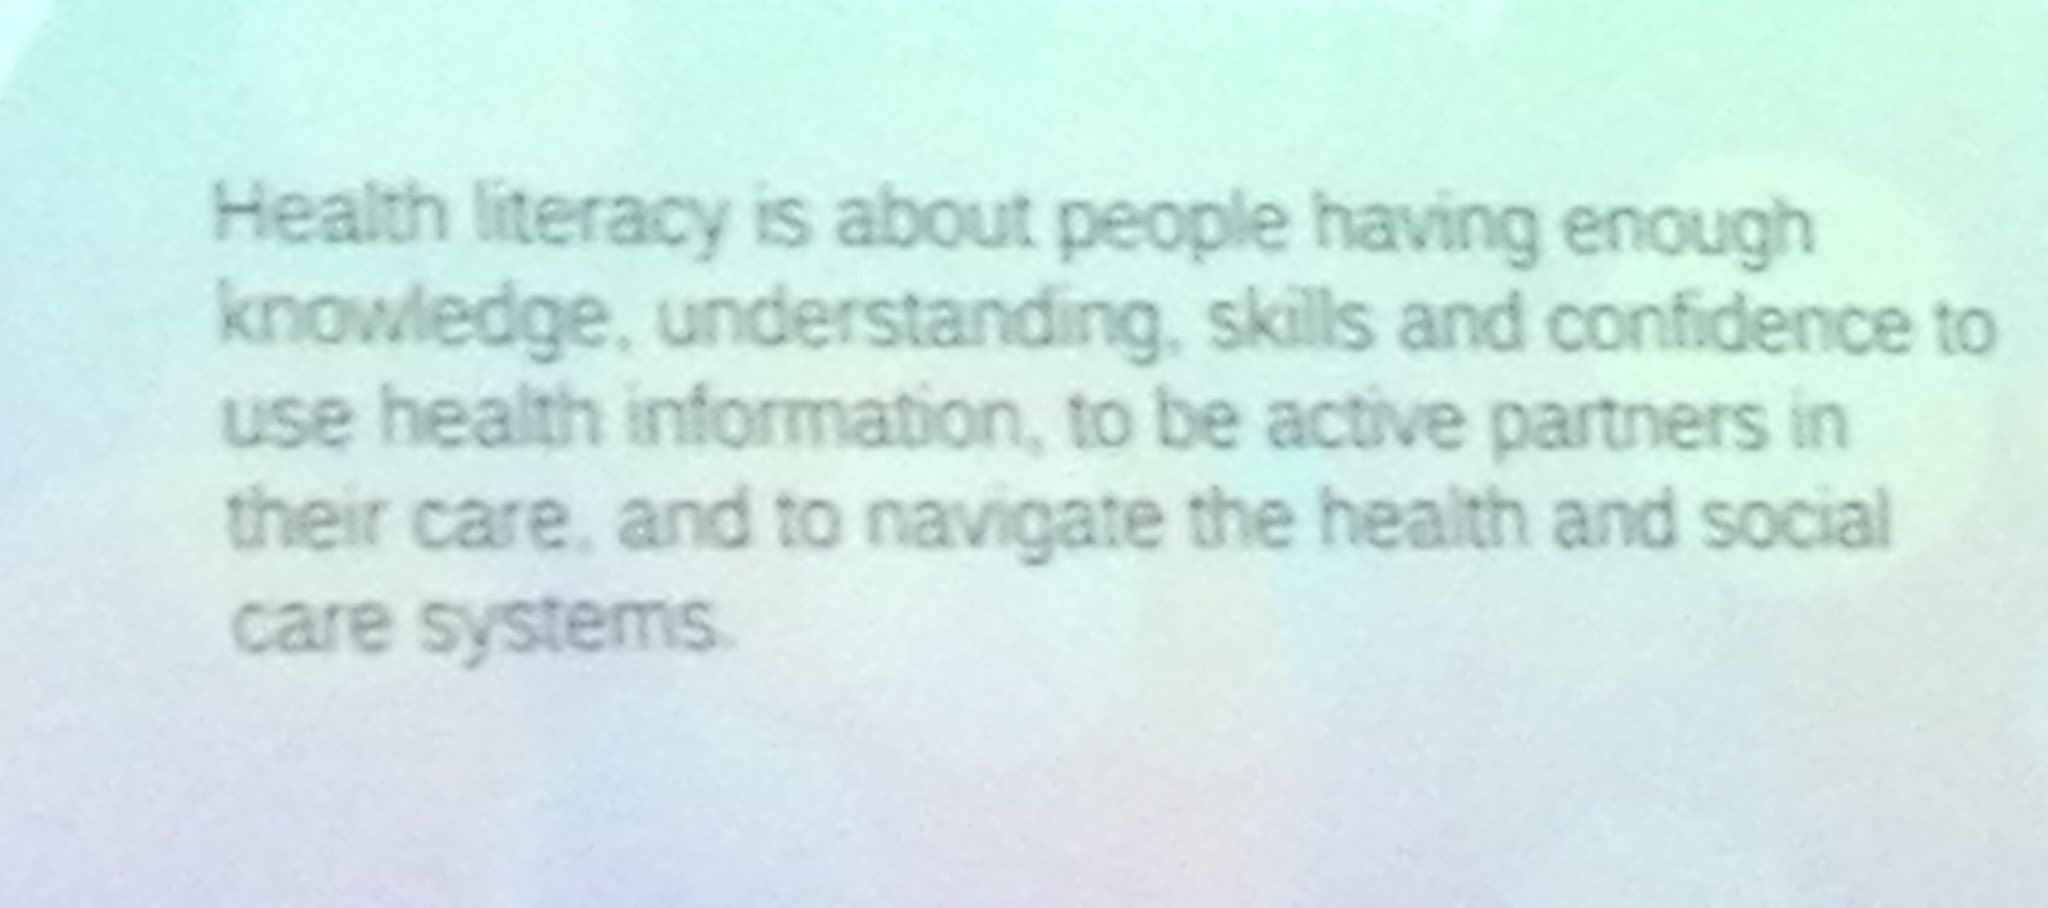 #scotinfolit @athain shares #healthliteracy definition and website https://t.co/JcAMqj3yEo https://t.co/R1RvDet21C